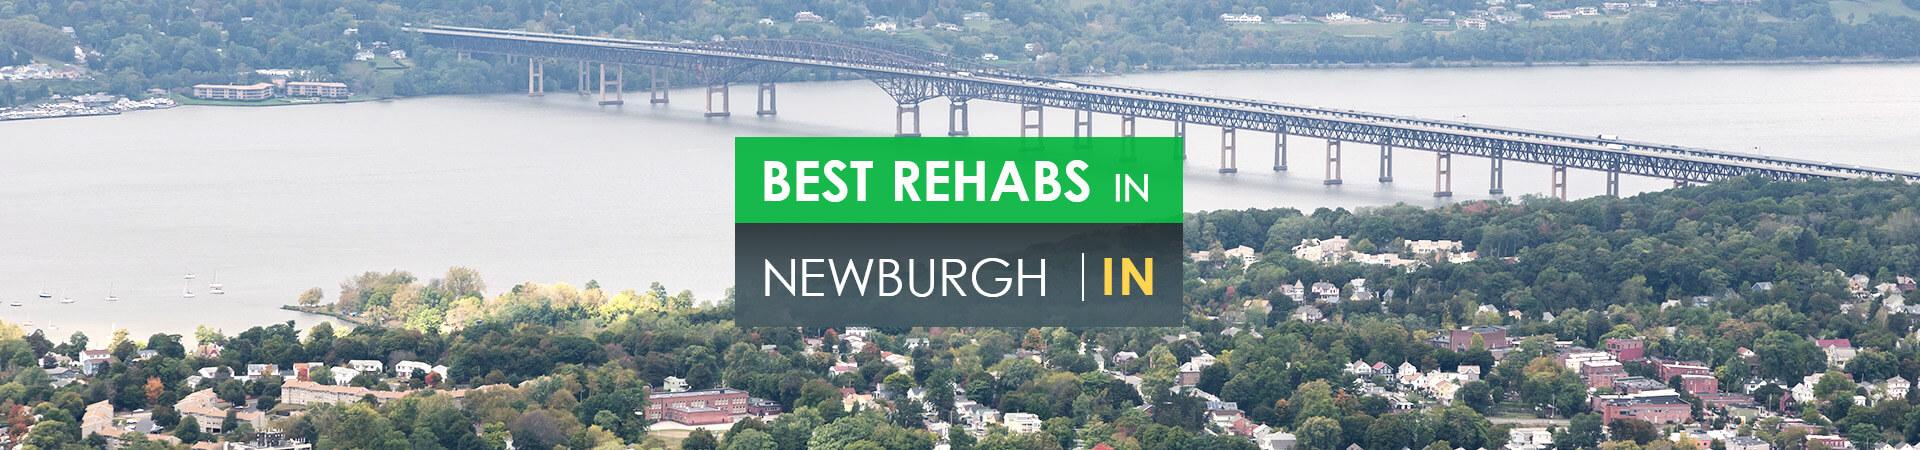 Best rehabs in Newburgh, IN